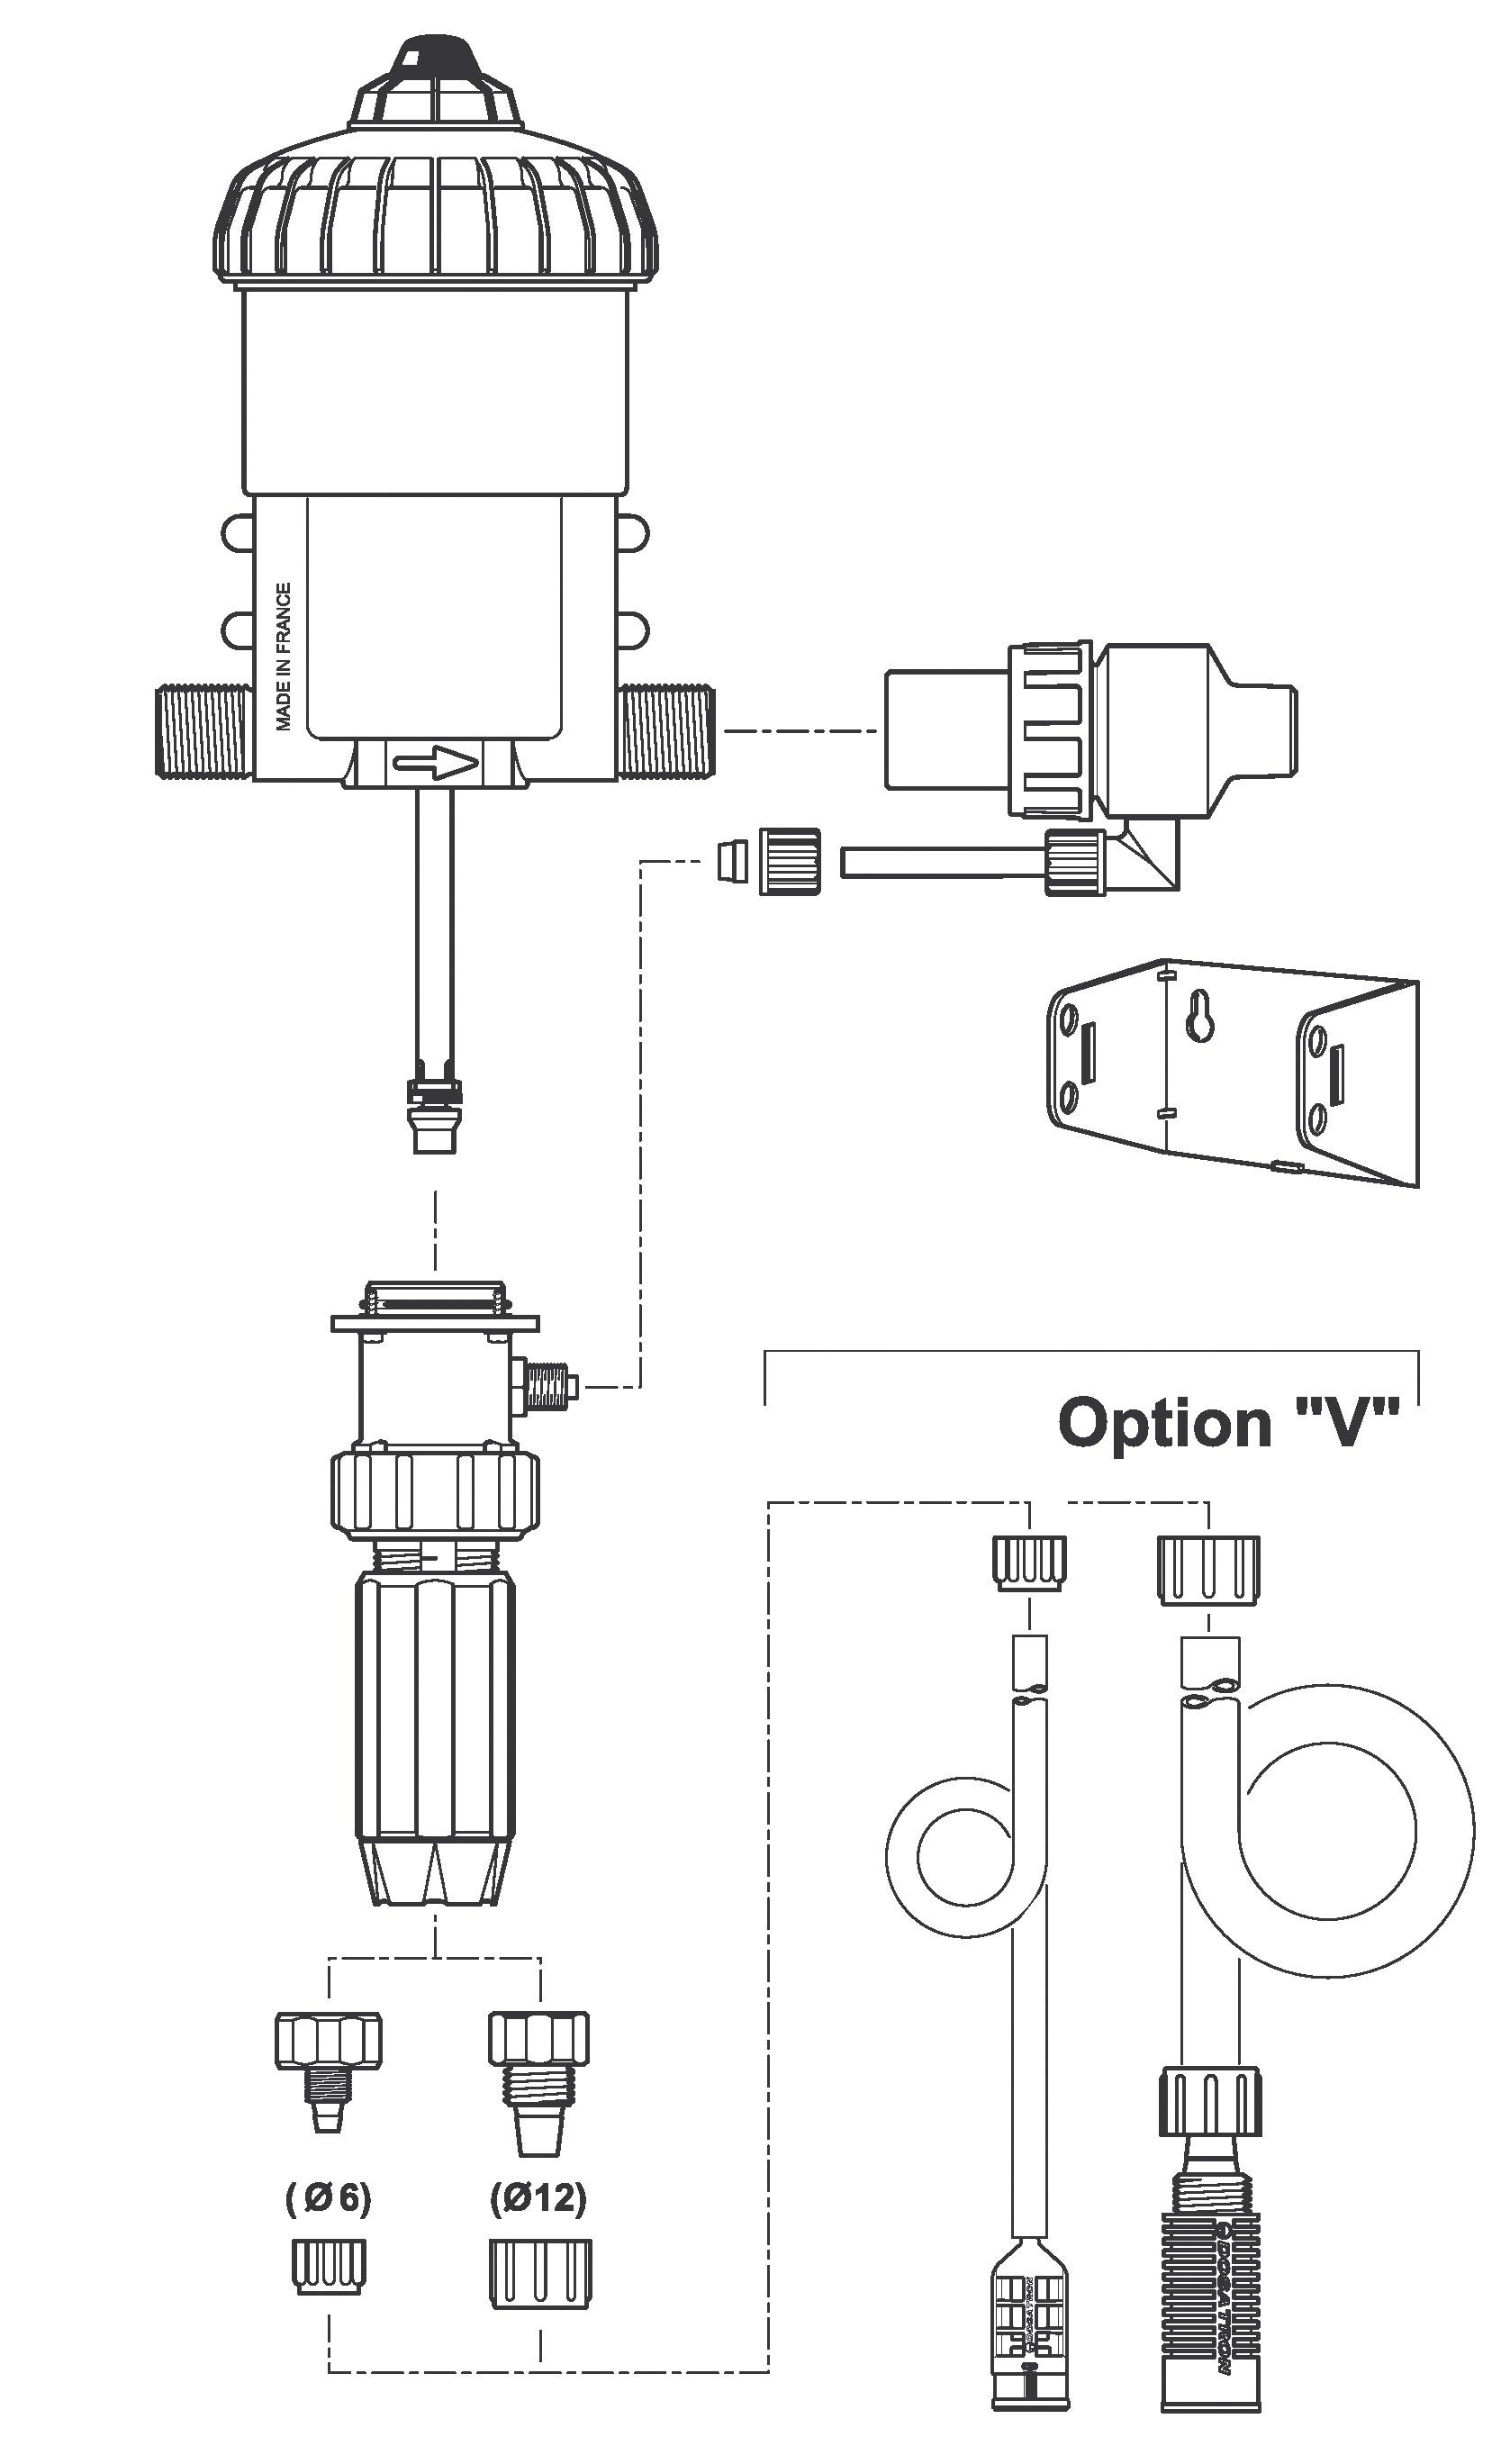 Dosatron spare parts